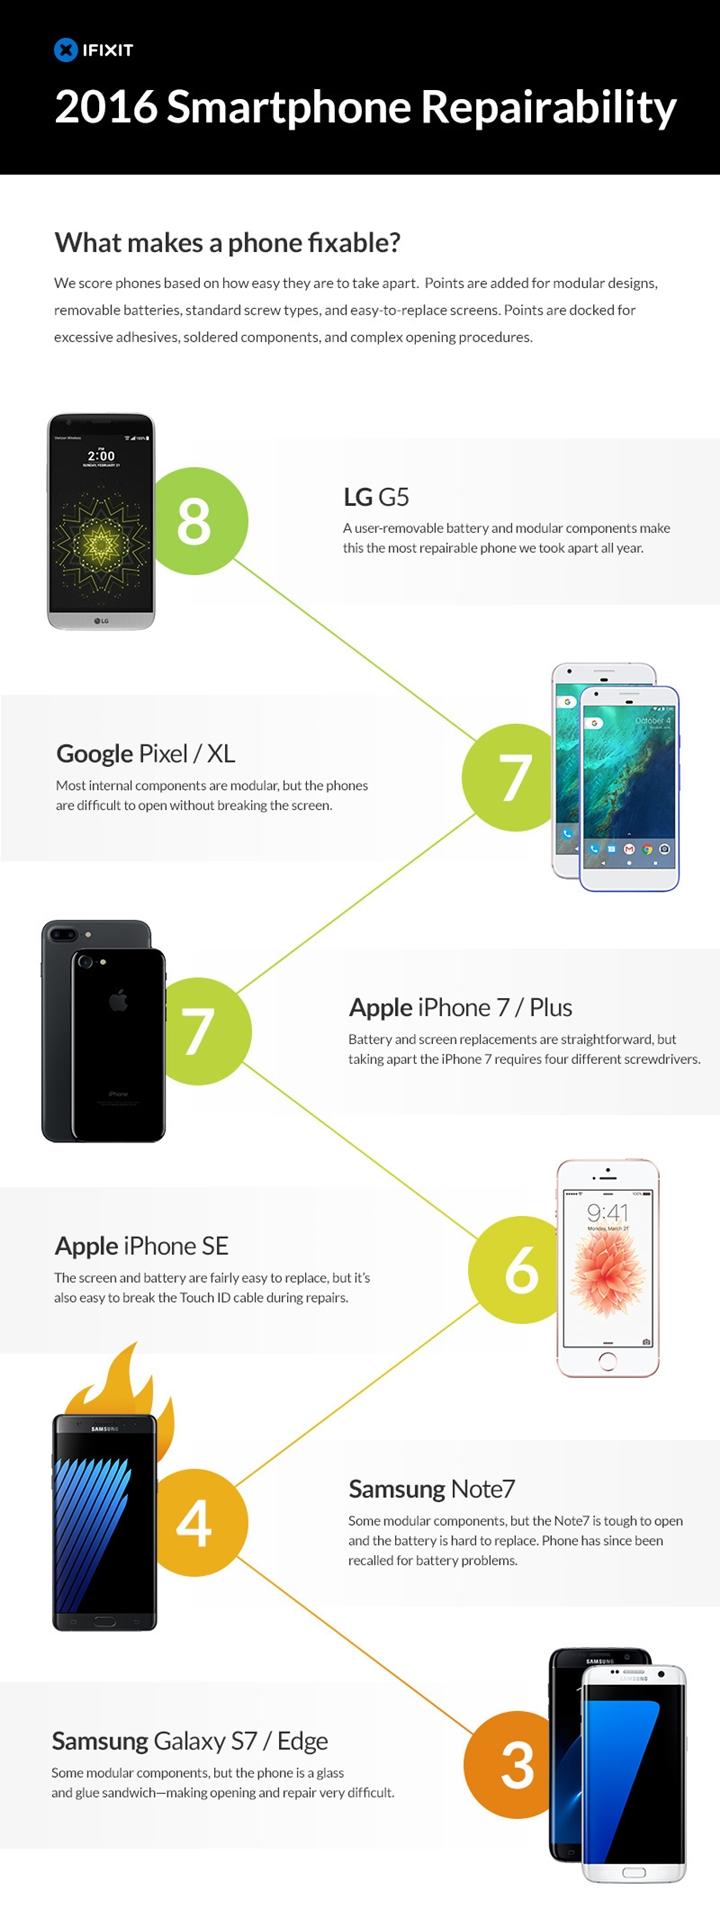 ifixit-2016-smartphone-repairability